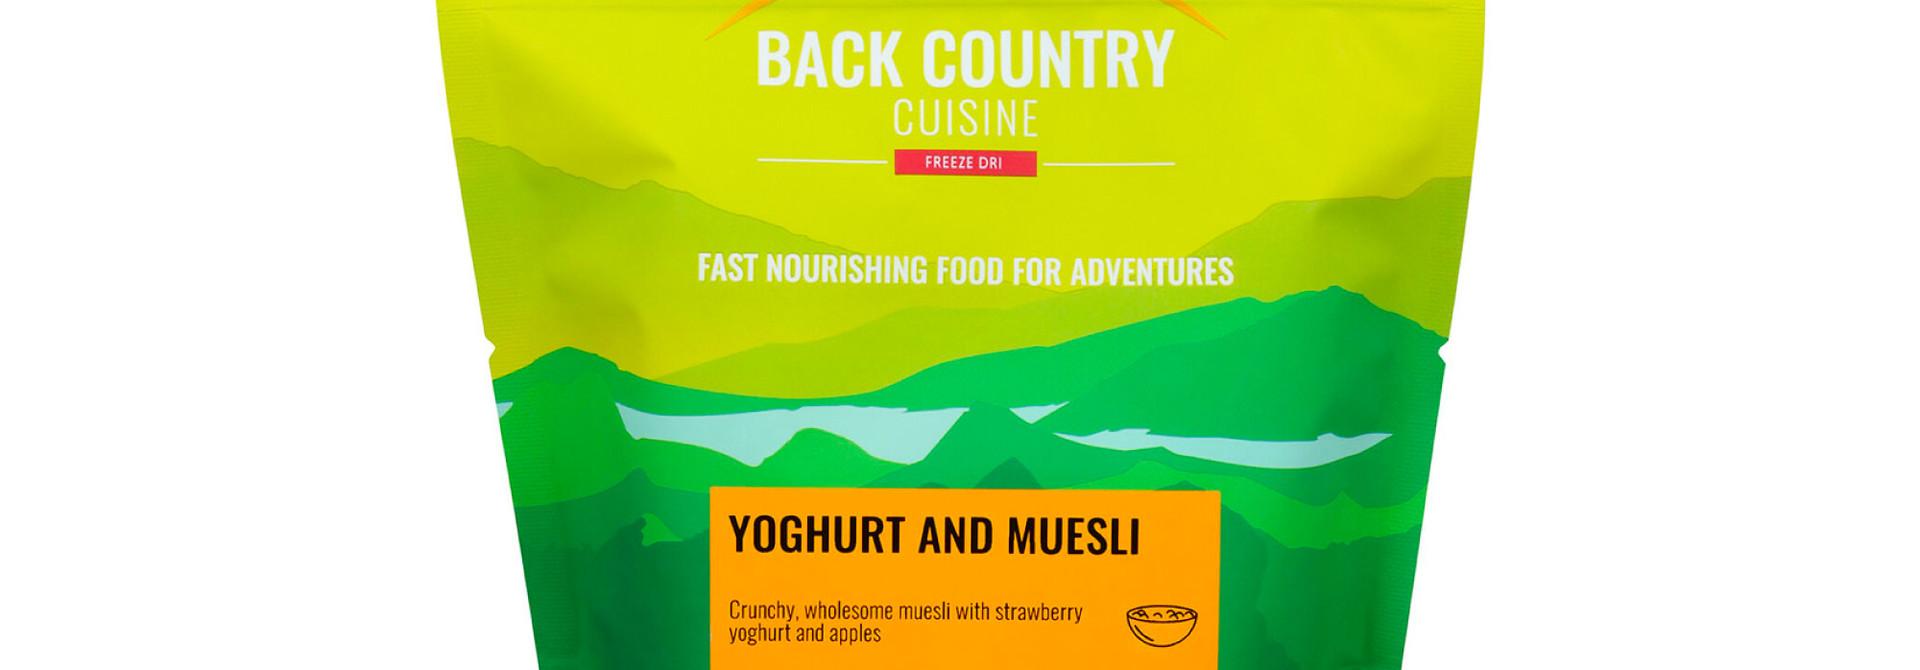 Back Country Cuisine Yoghurt & Muesli Small